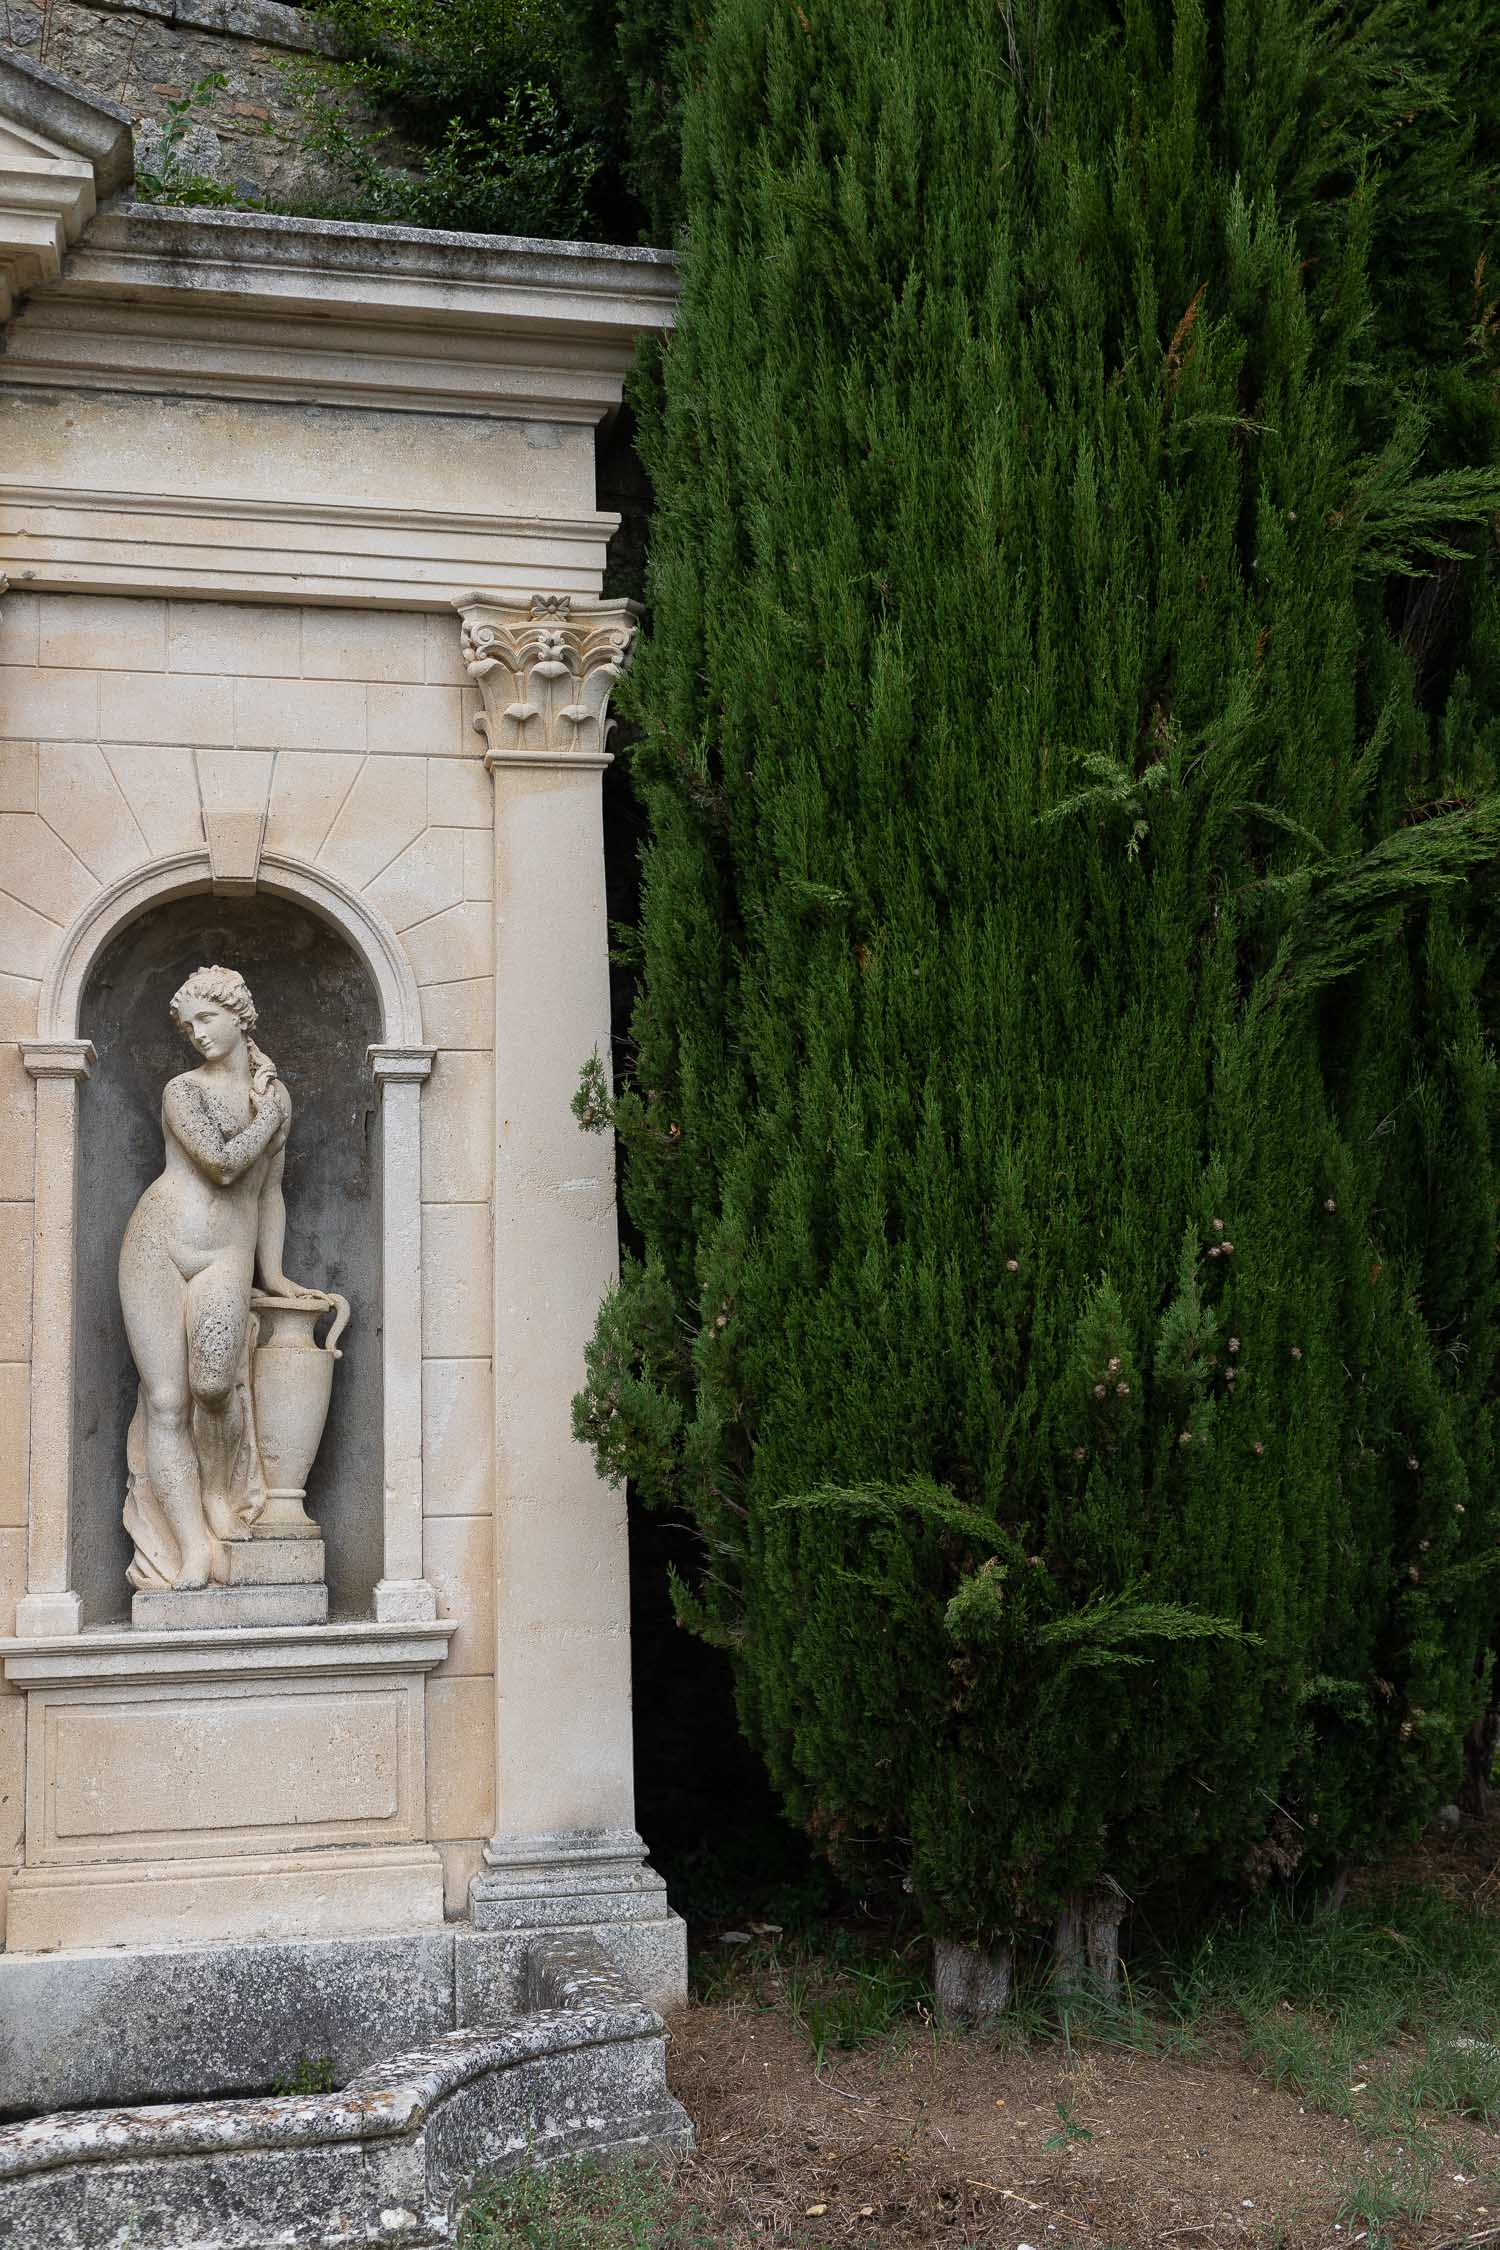 Tuscany-La-Bagnaia-Golf-Club-Statue-01849.jpg